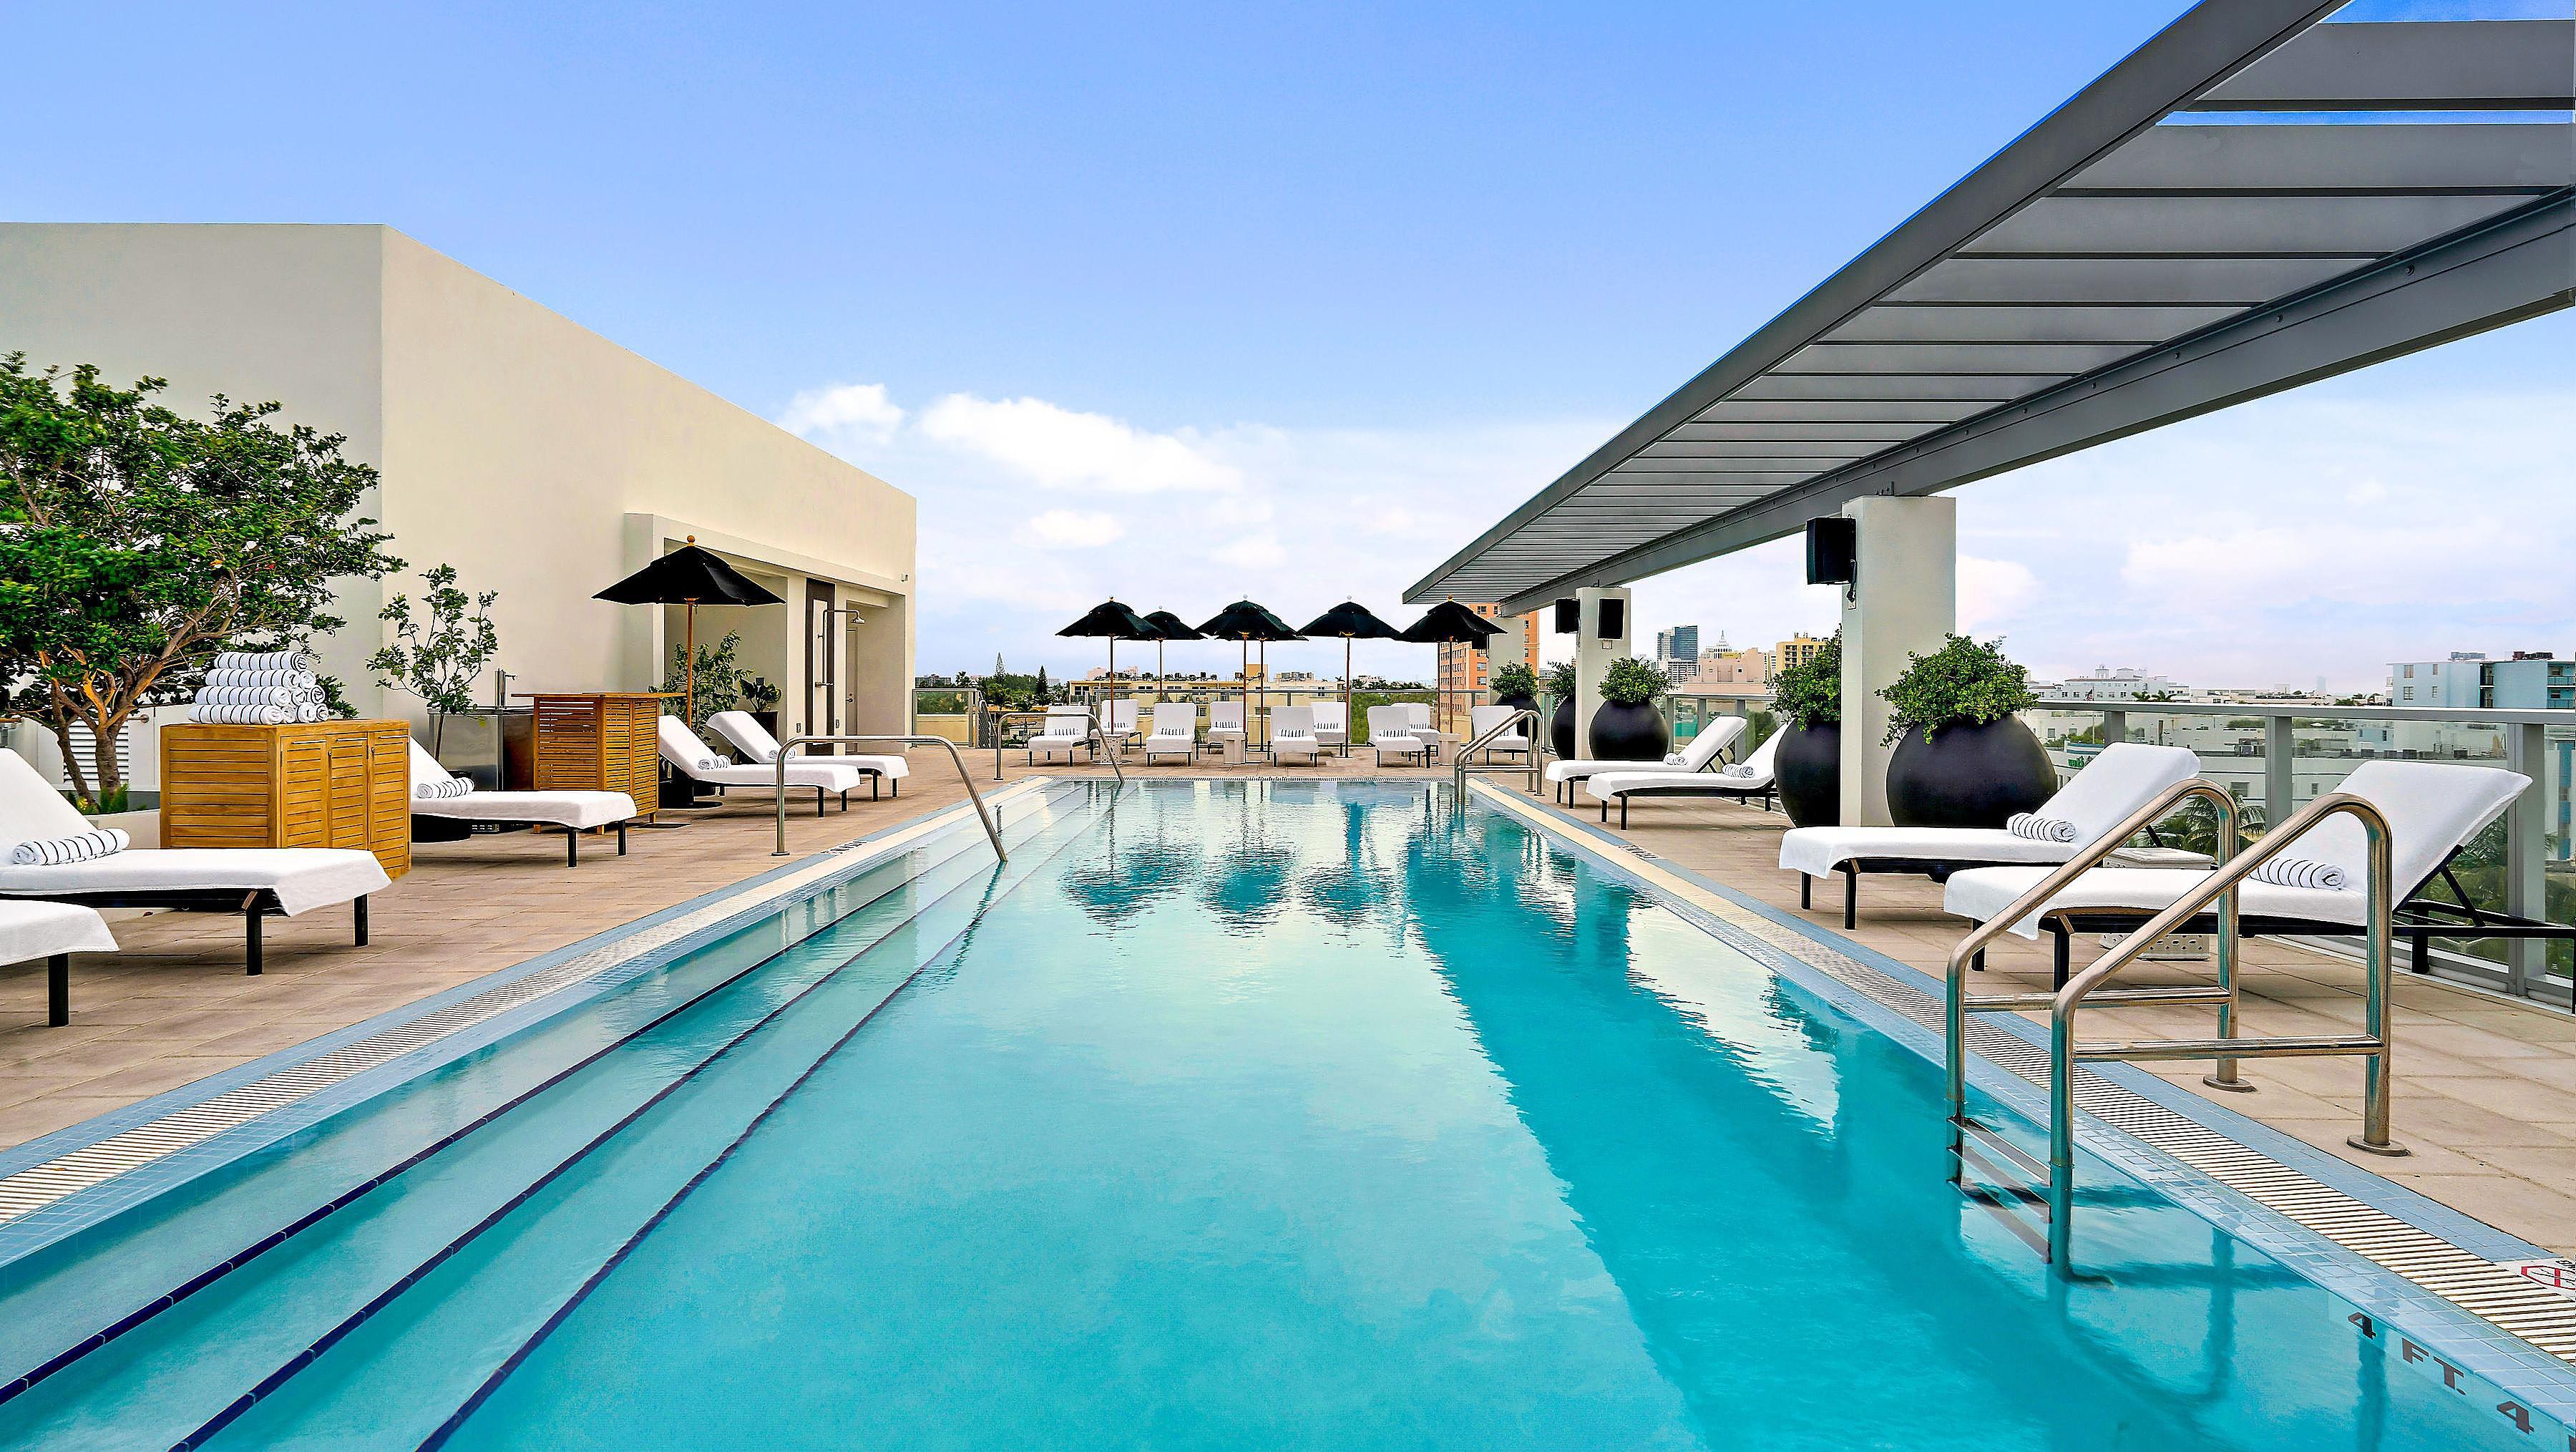 Kimpton Angler's Hotel in Miami Beach | Kimpton Hotels